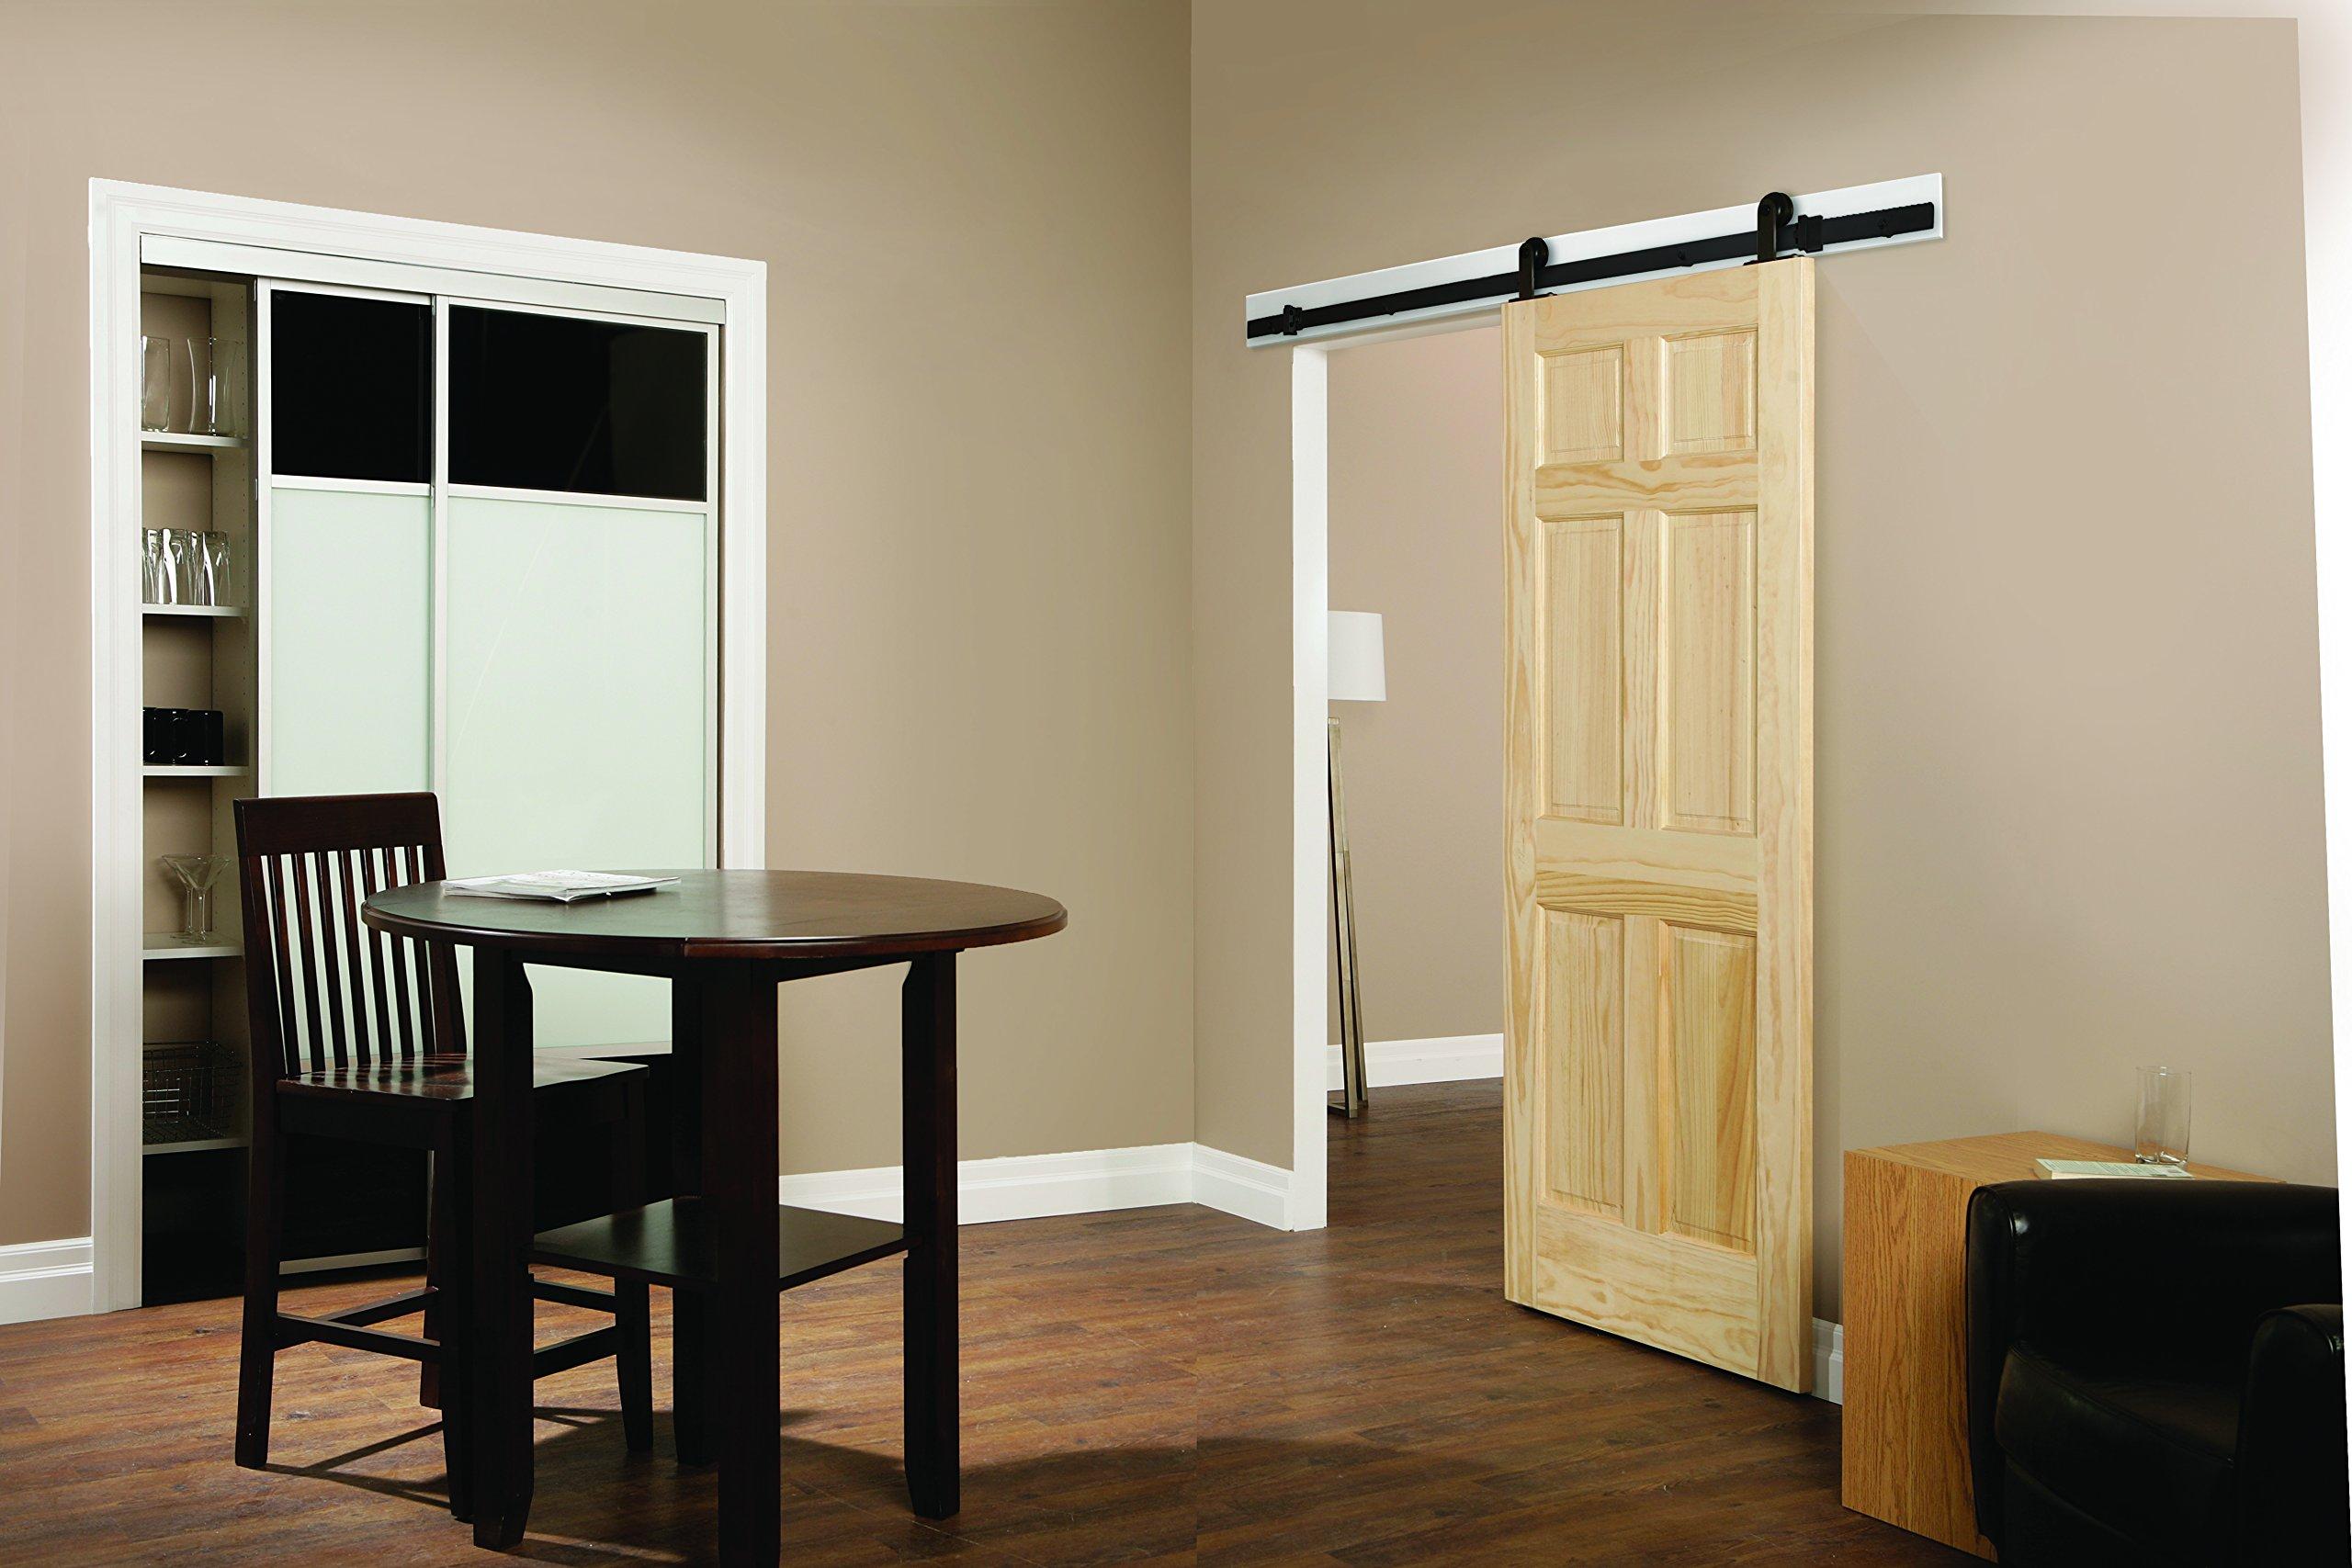 Casa Design & Decor BD101K-07800-MB Rustic Barn Door Hardware Kit